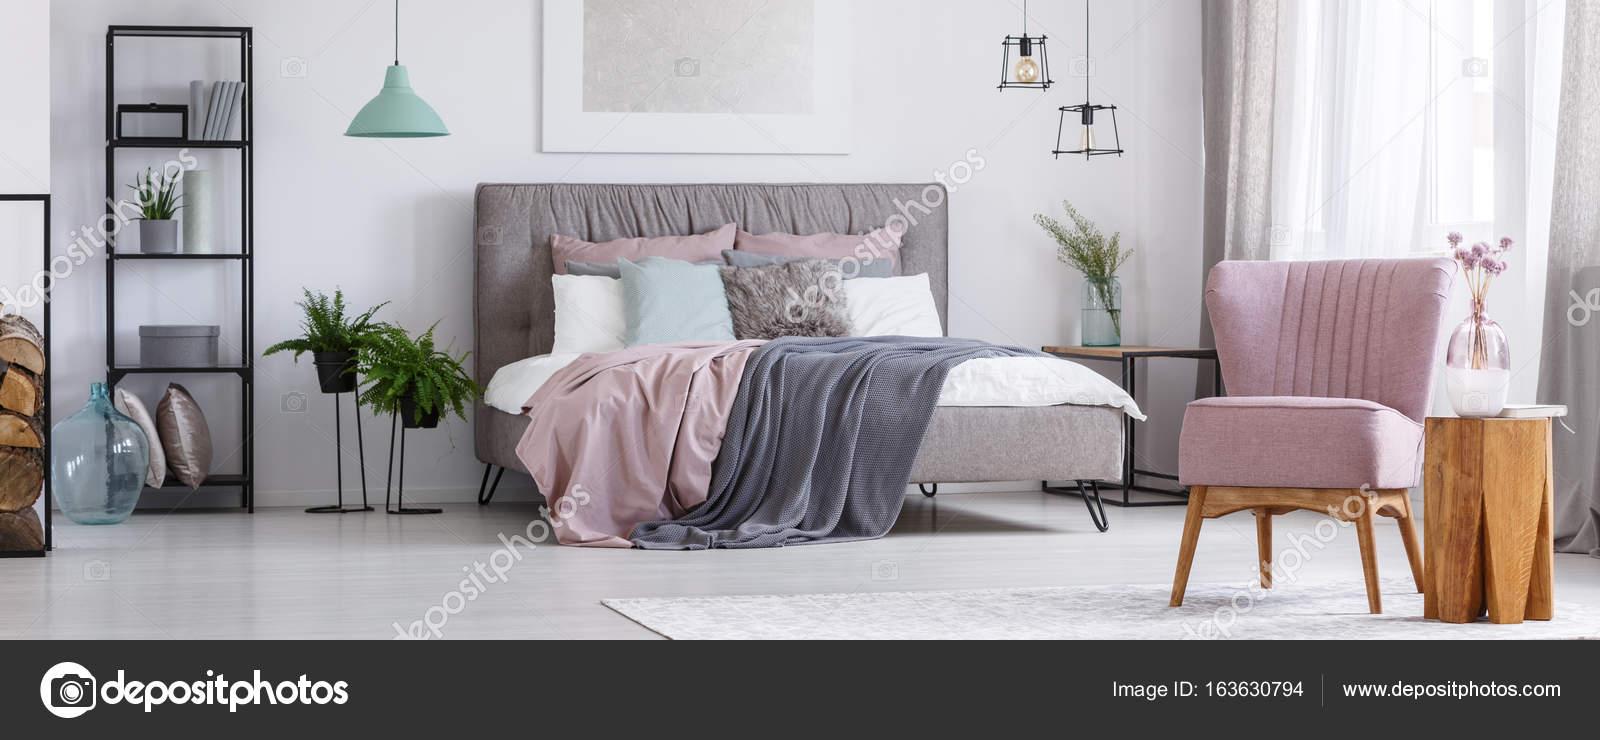 Rosa Stuhl im Schlafzimmer — Stockfoto © photographee.eu ...